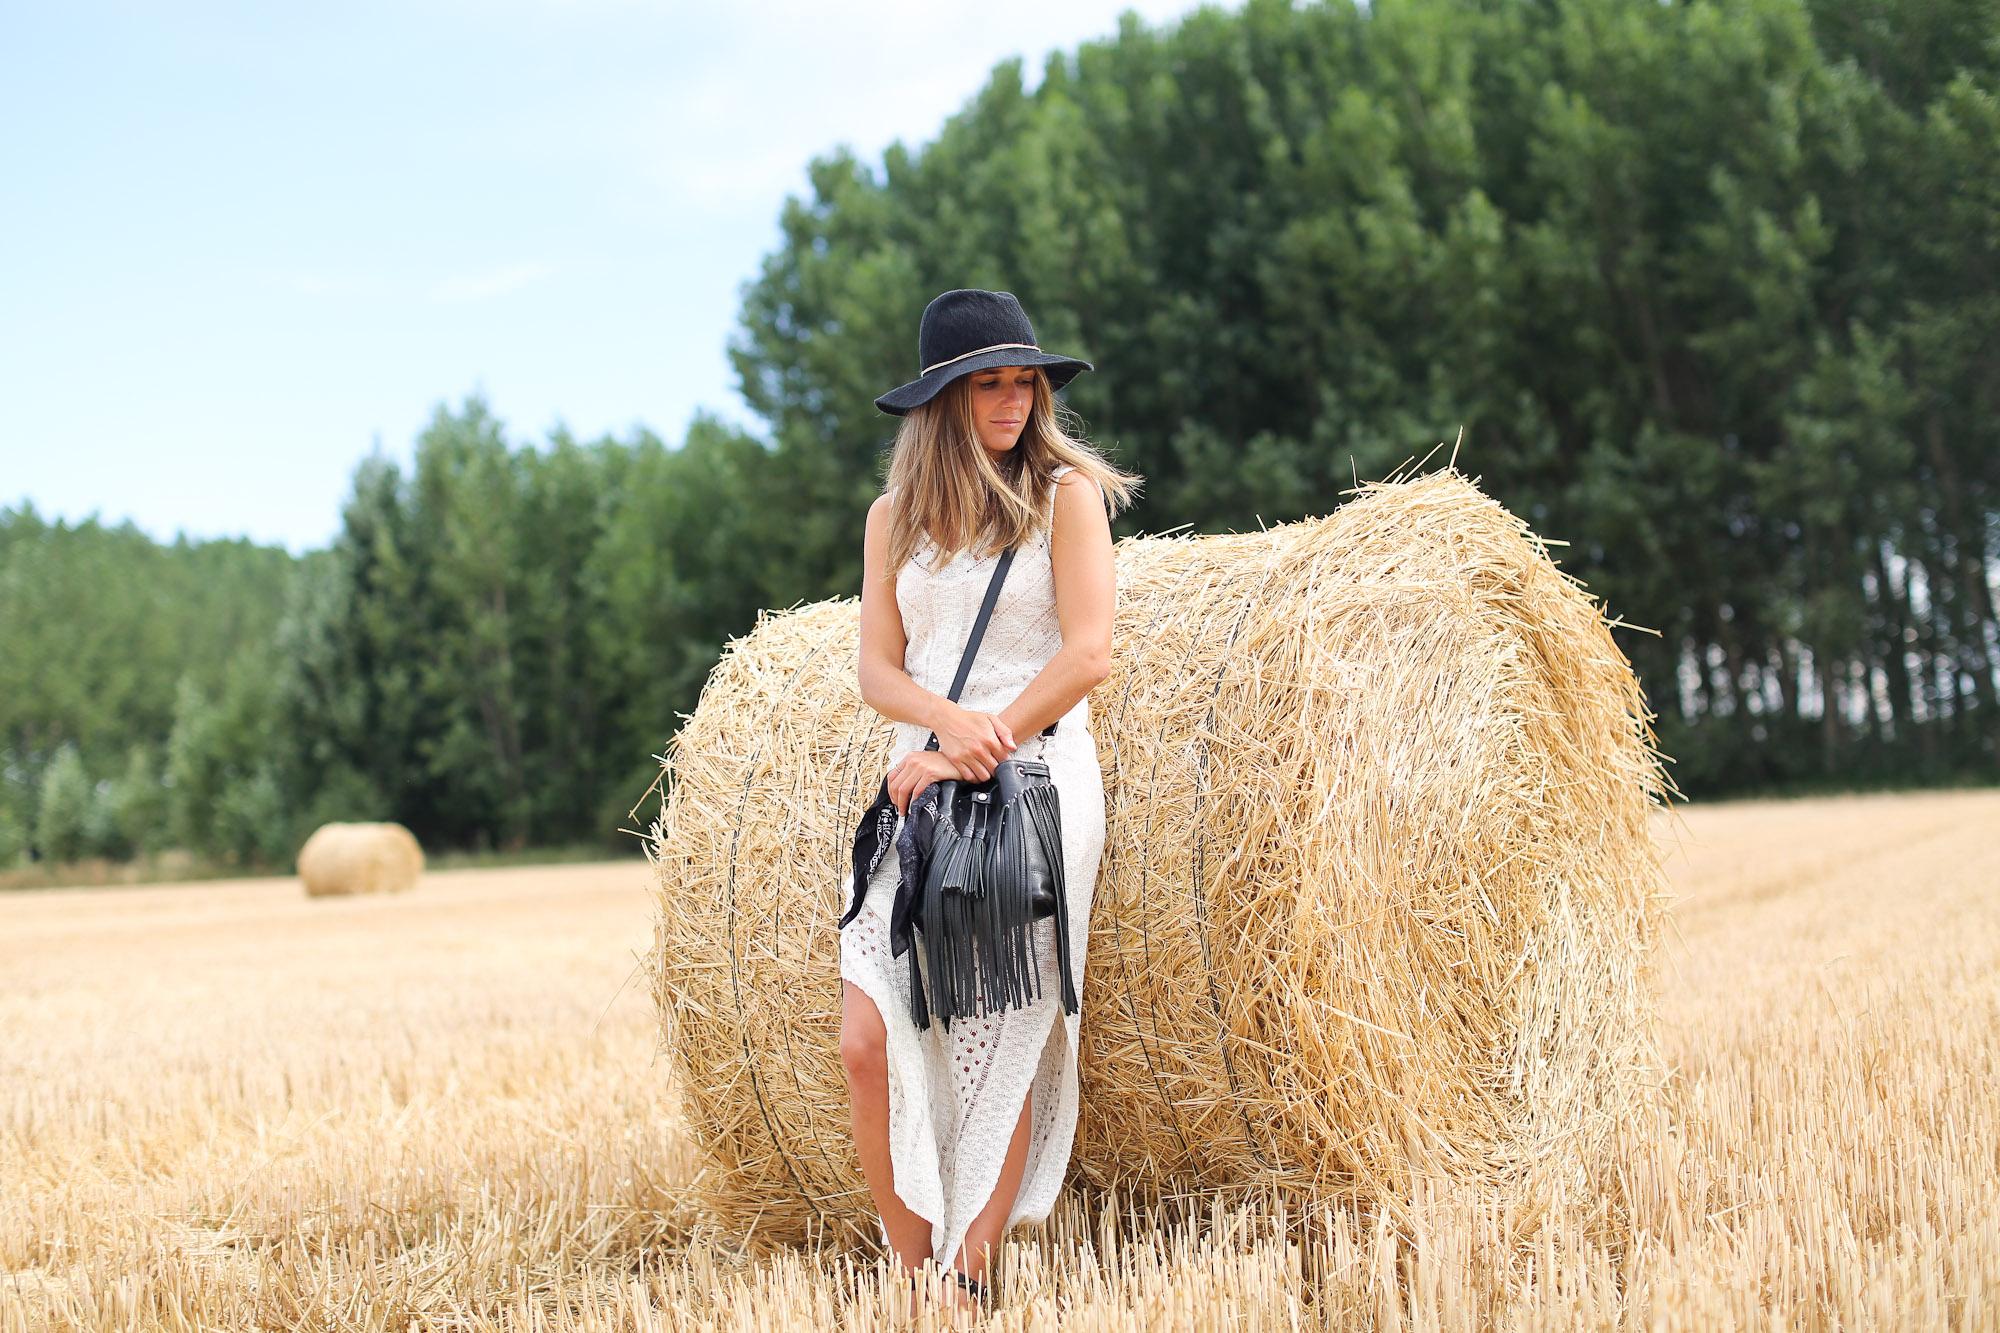 Clochet_sandro_anik_leather_Bag_long_crochet_dress_fedora_hat-3